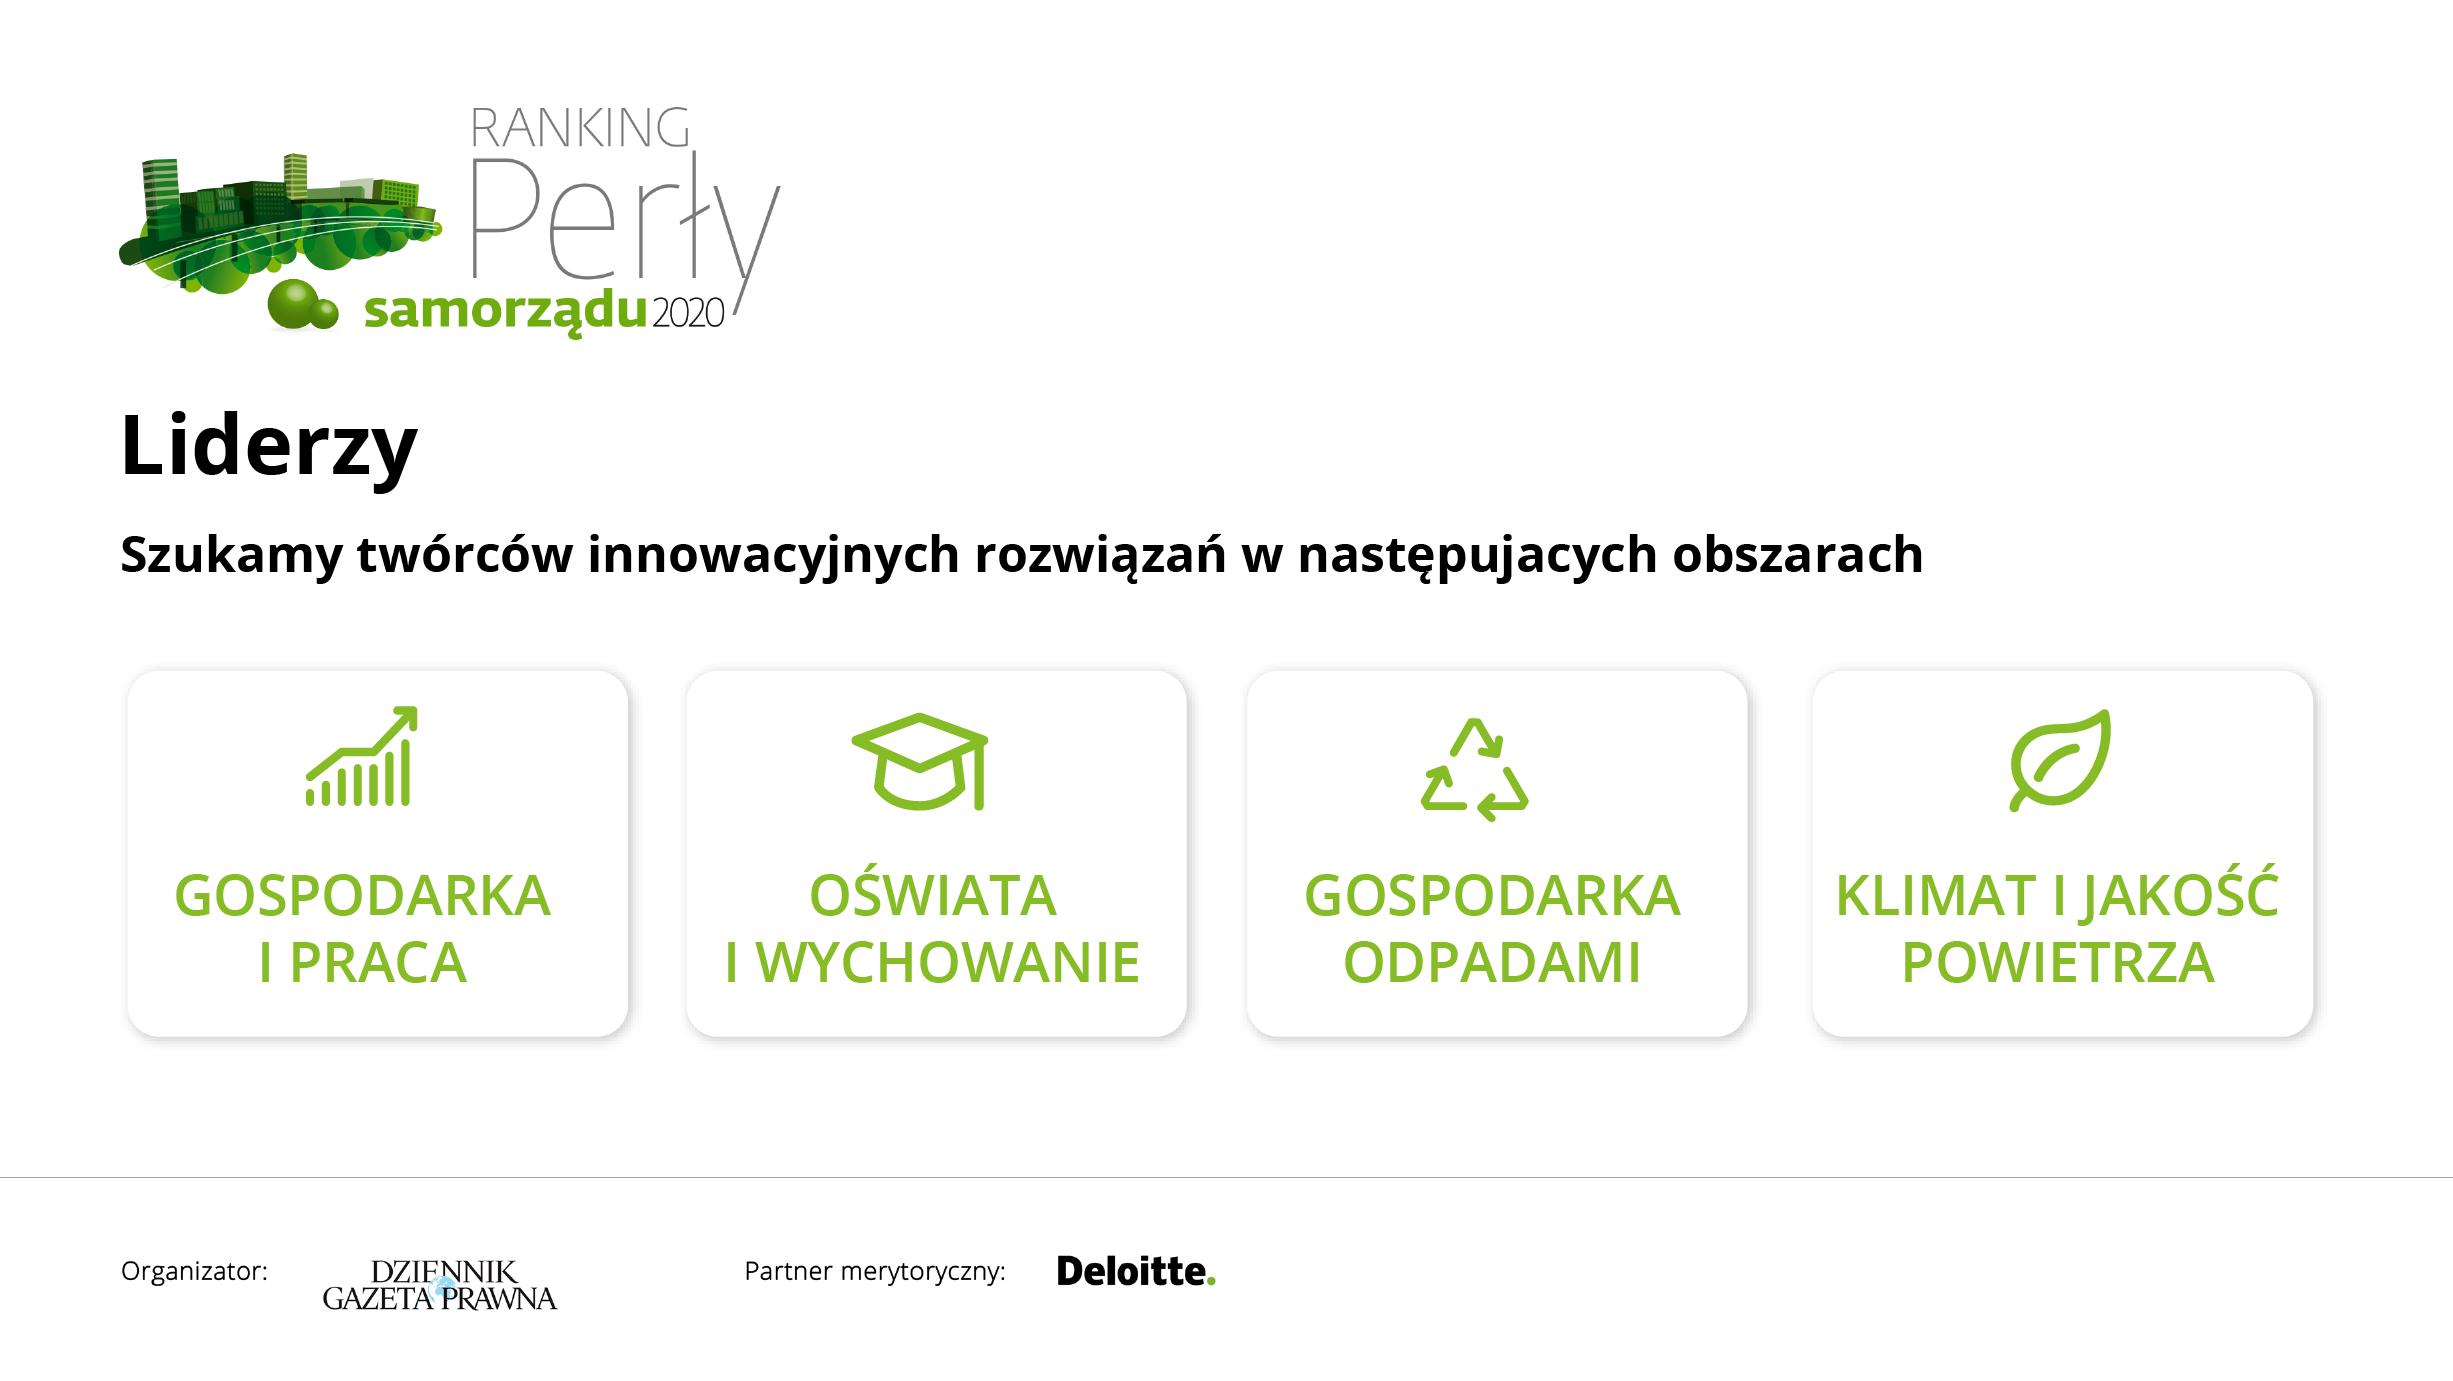 pl_Ranking-Perly-Samorzadu-2020_liderzy.png (2453×1381)